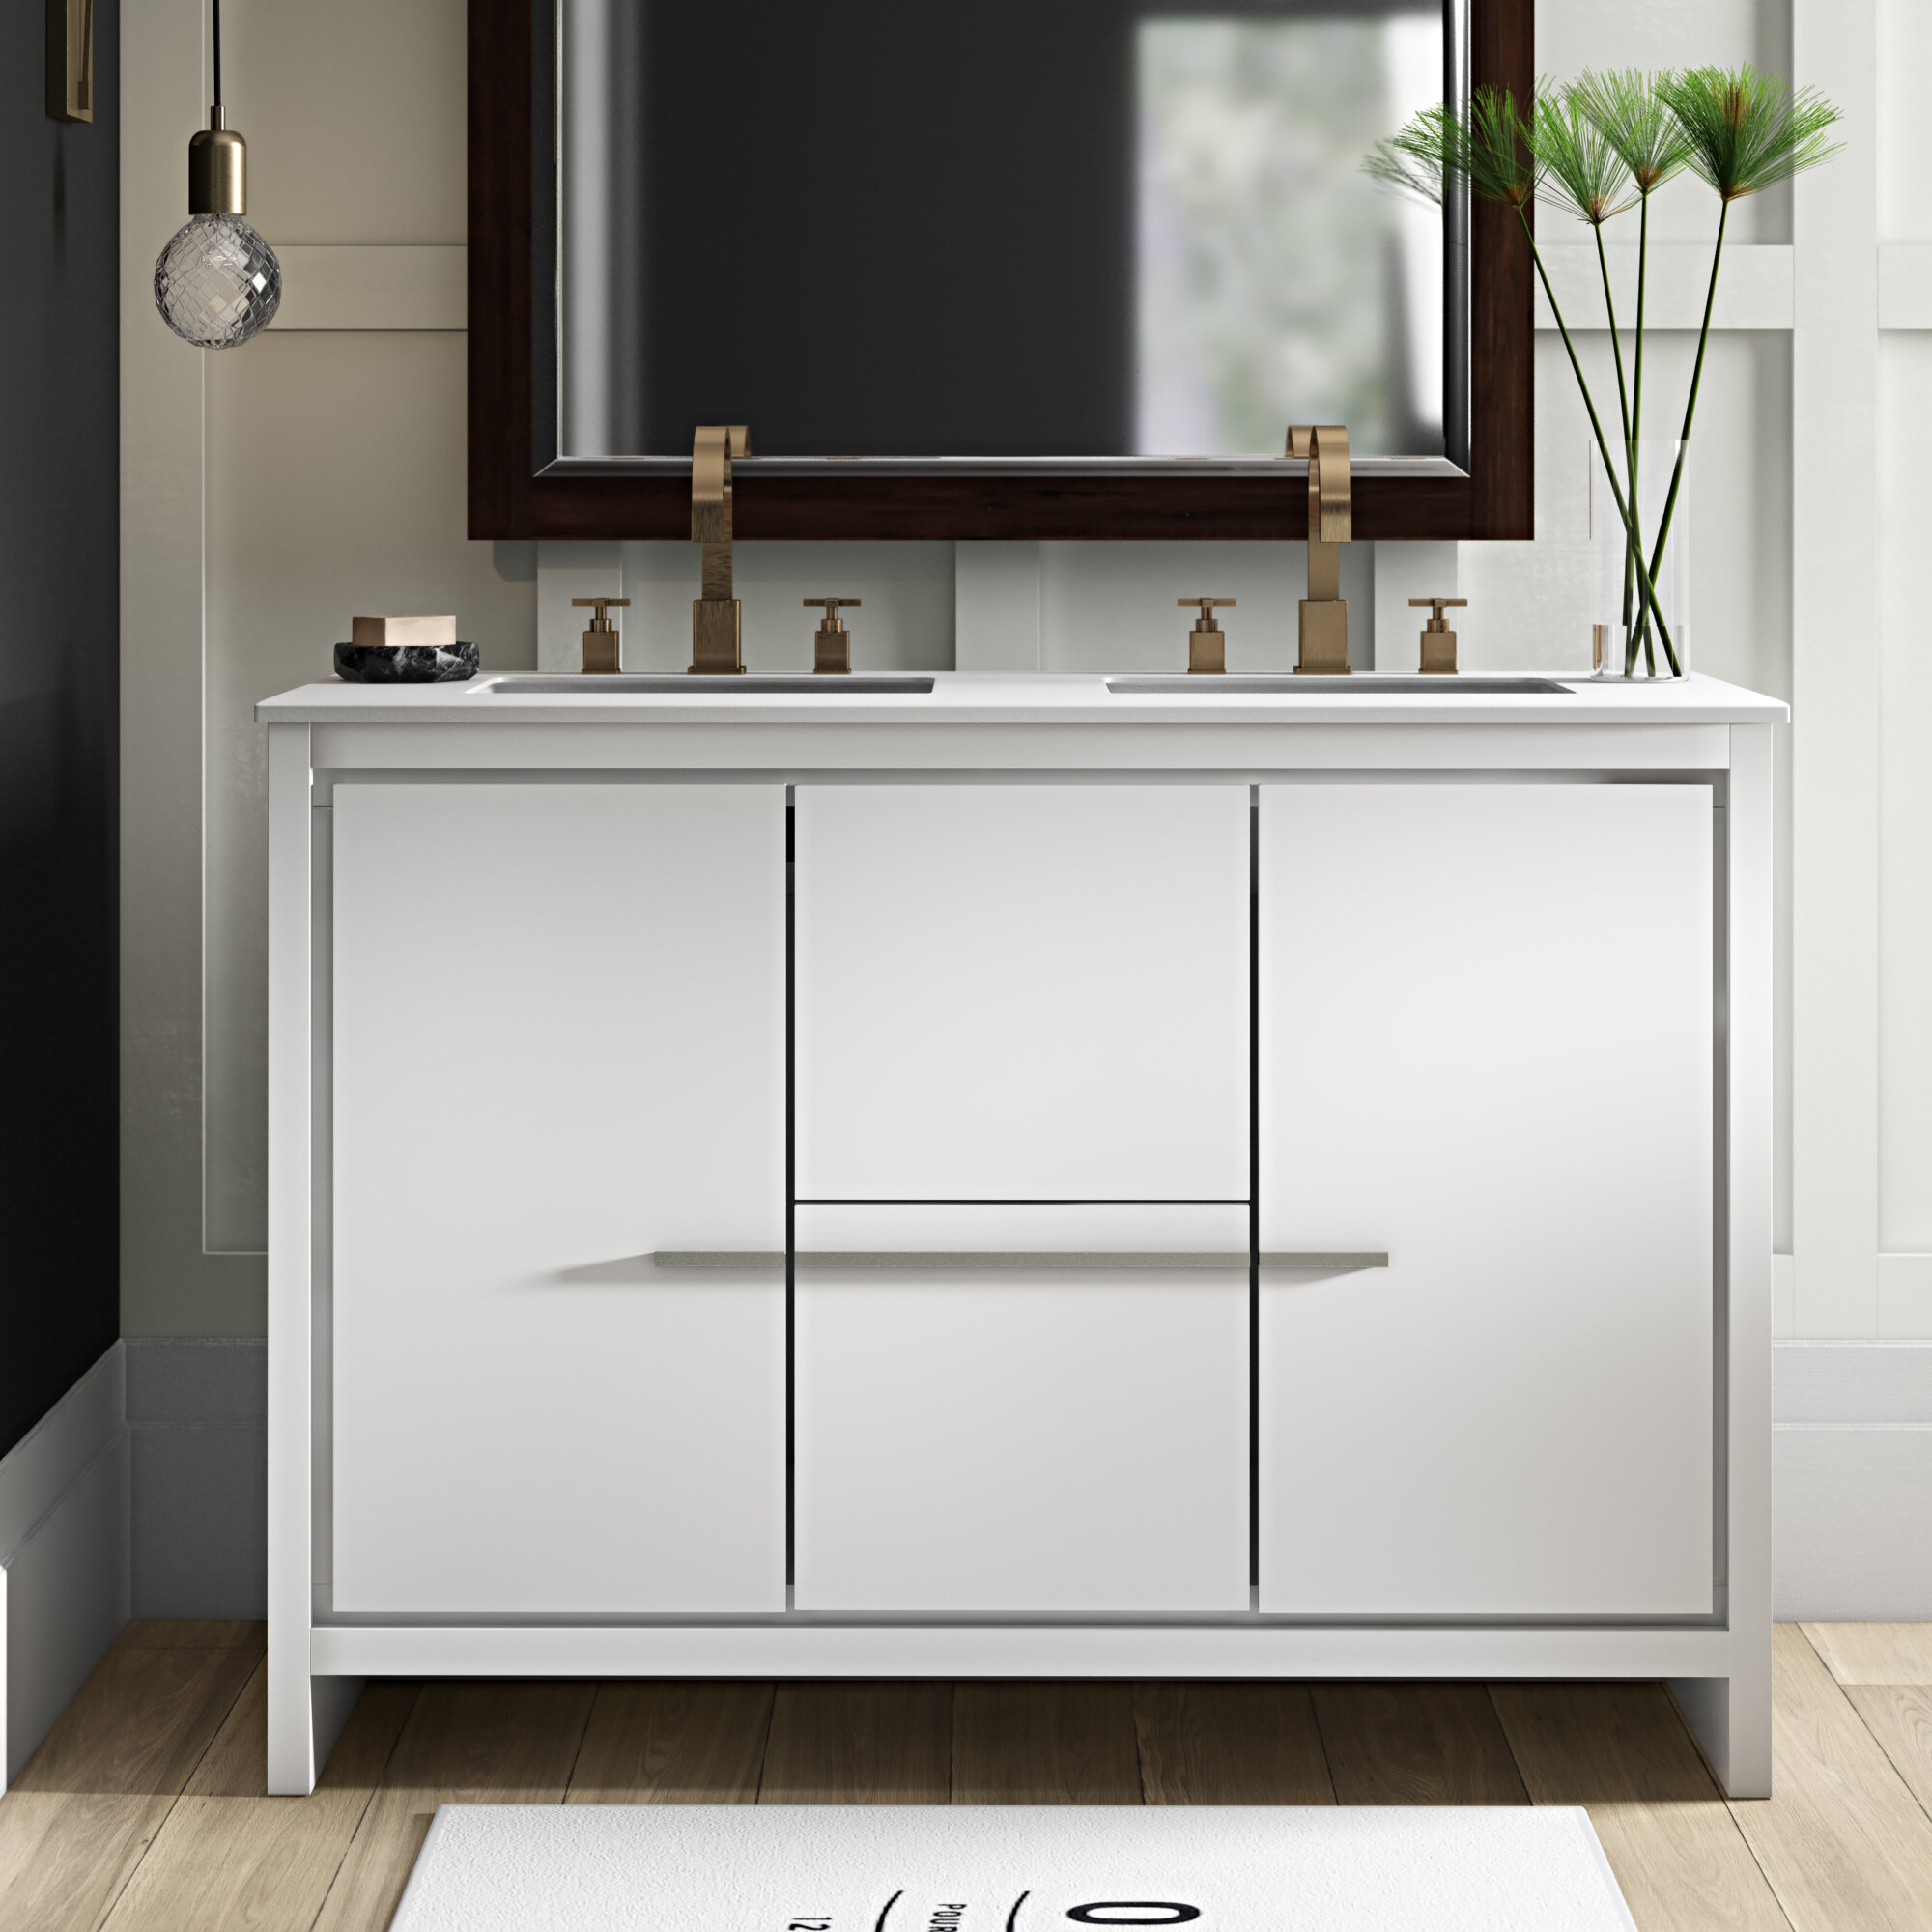 Swell Bosley 48 Double Sink Modern Bathroom Vanity Set Download Free Architecture Designs Lectubocepmadebymaigaardcom